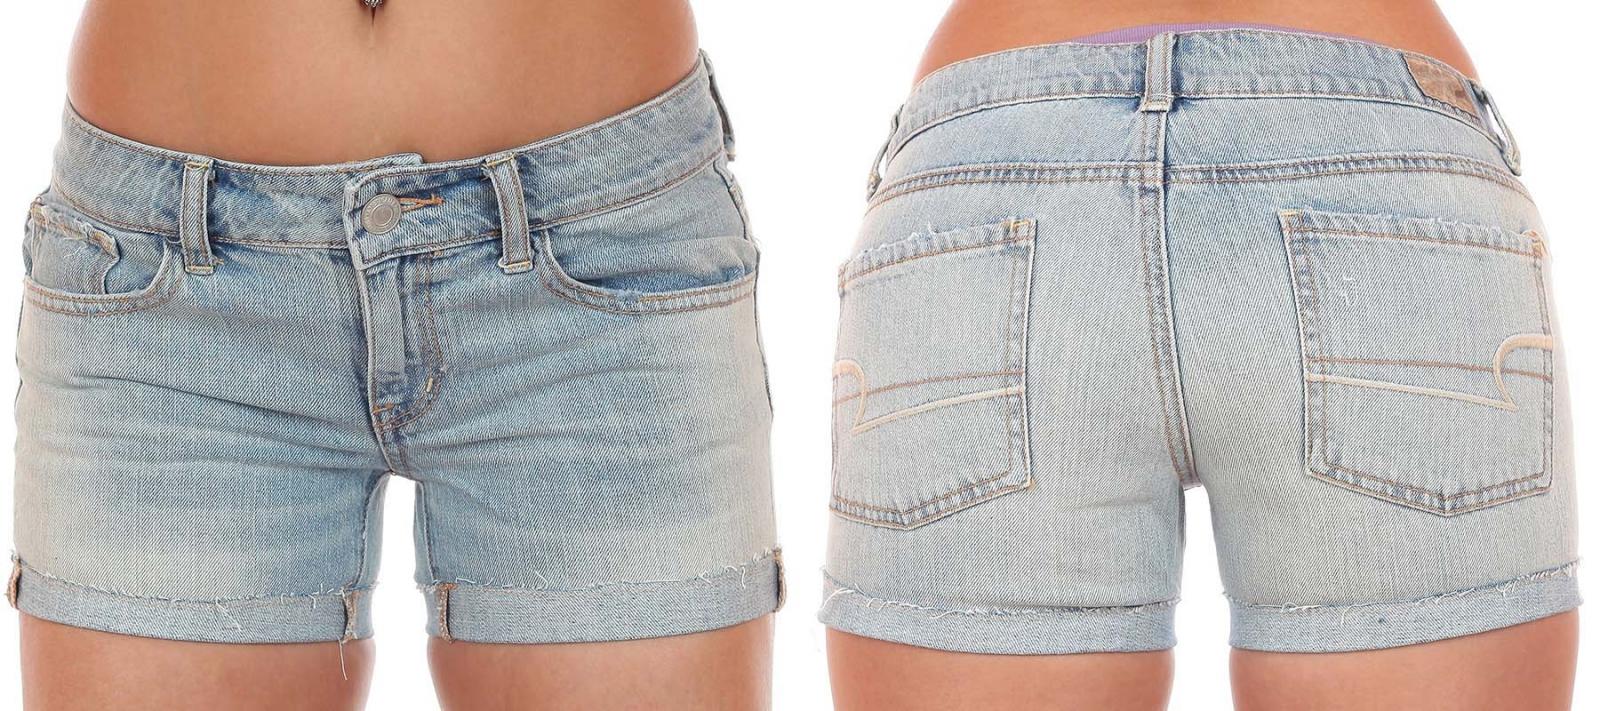 Женские шорты недорого